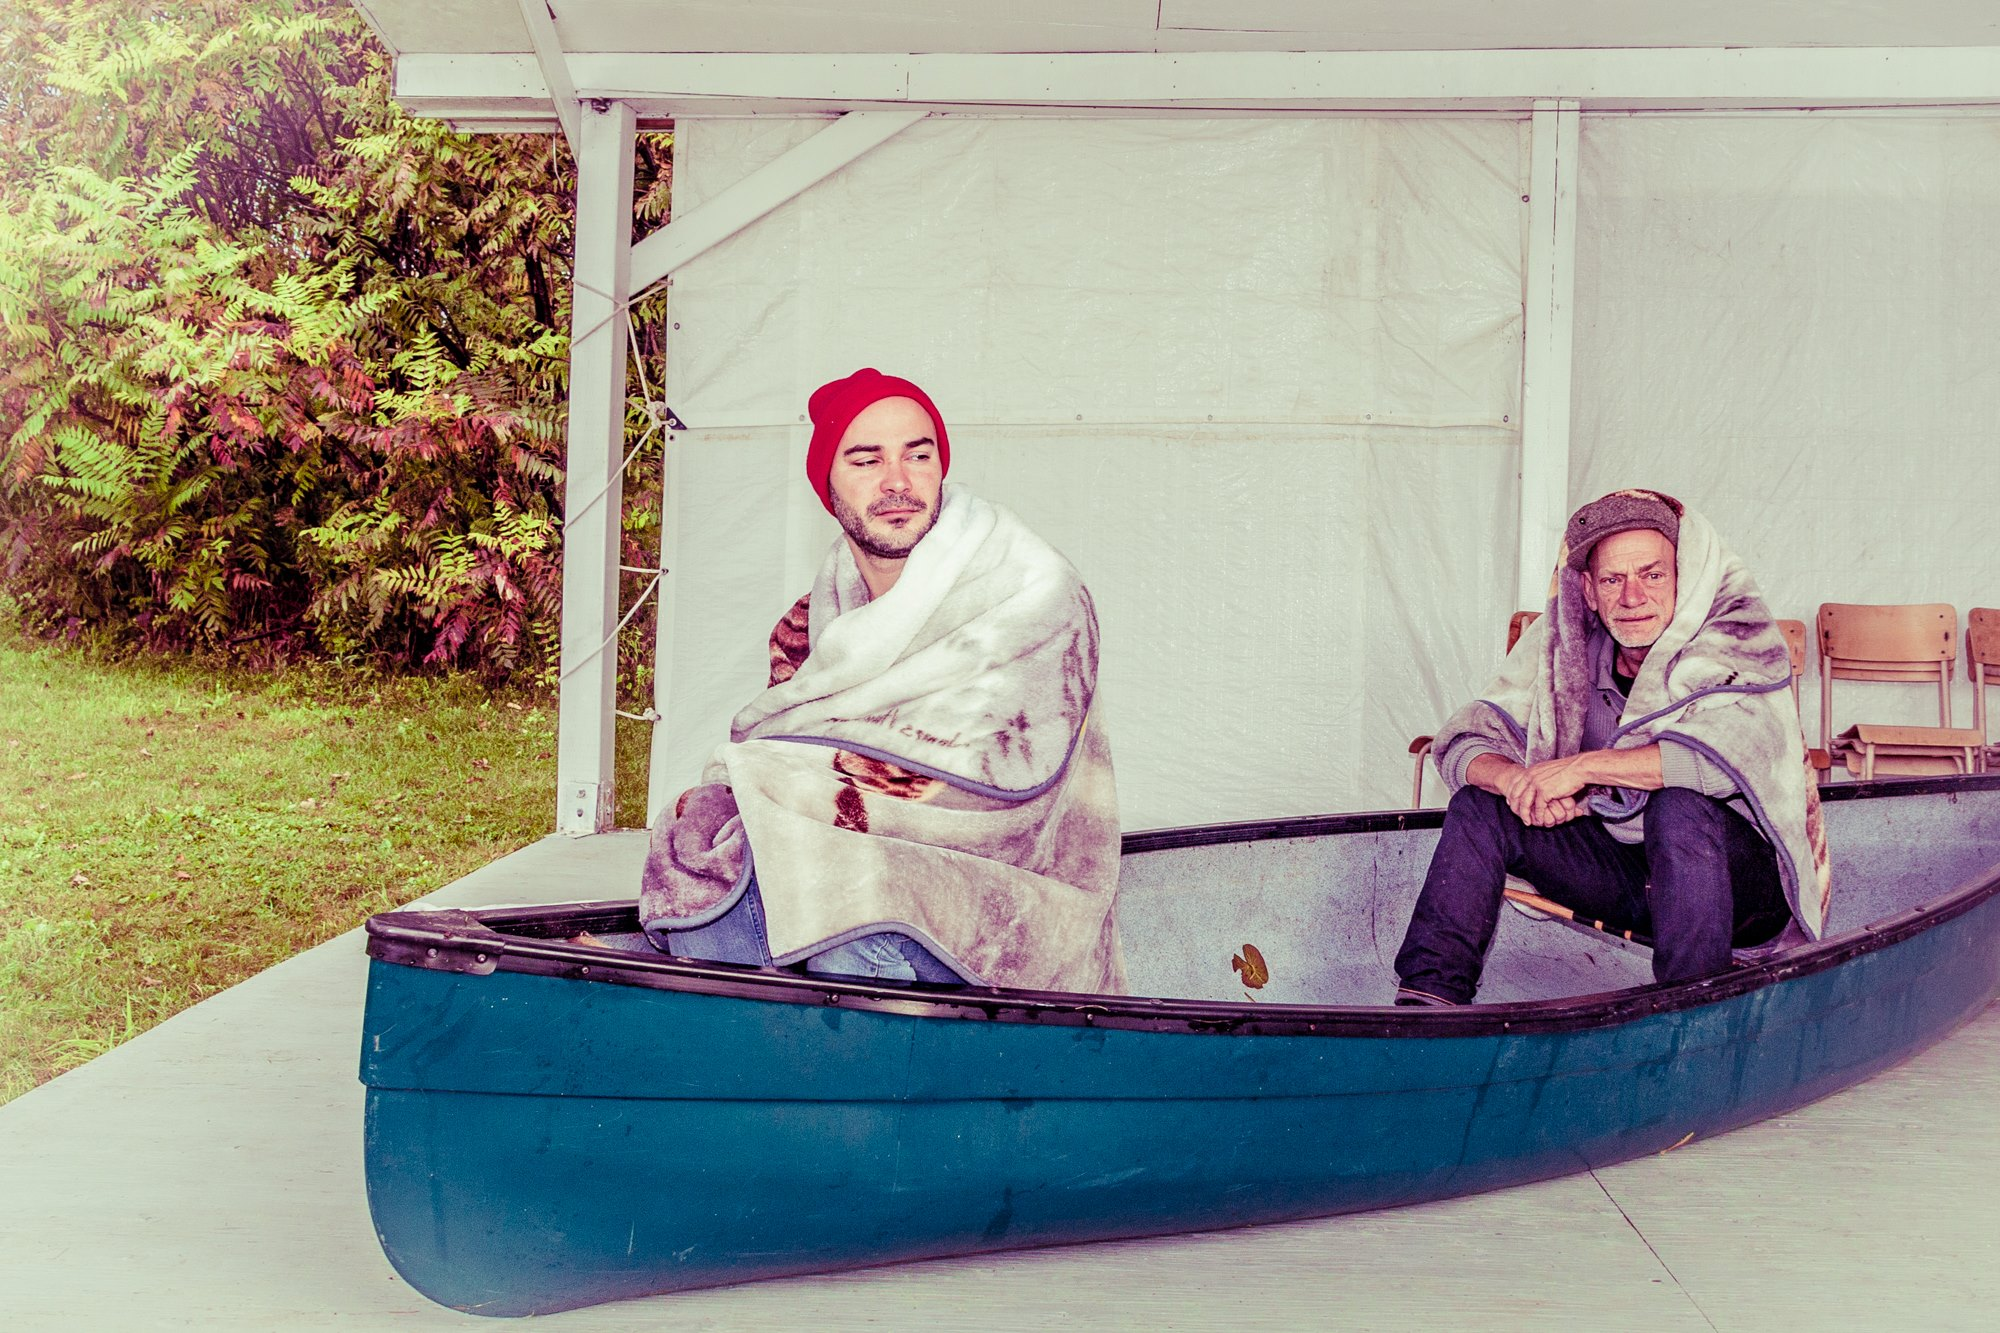 Photo promotionnelle du spectacle  Windigo  de Laura Kramer. Photo : Stefan Petersen